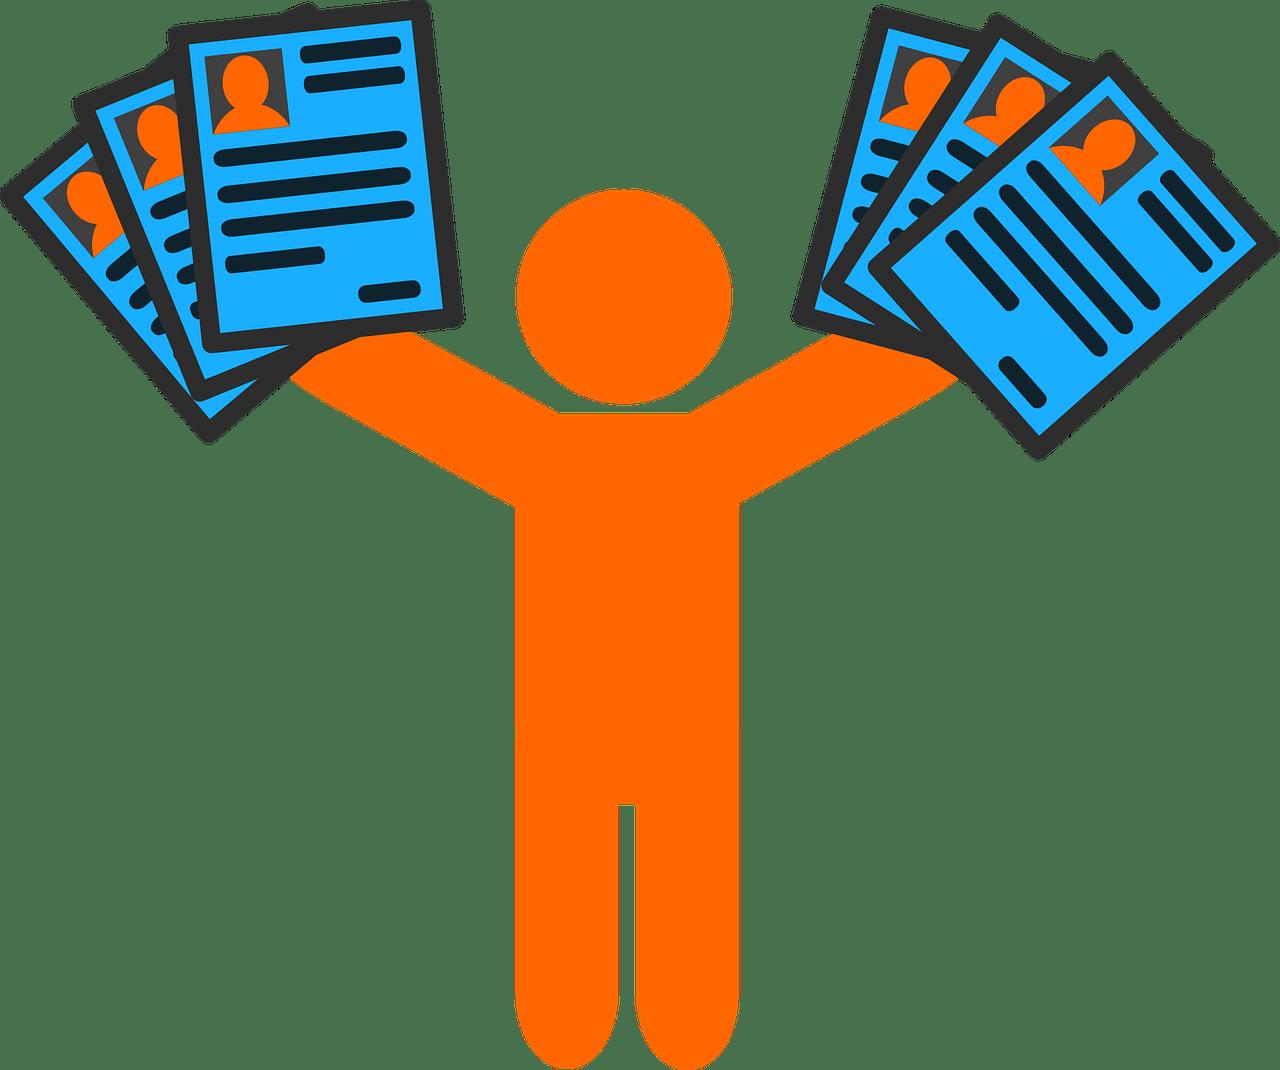 resume-2163673_1280